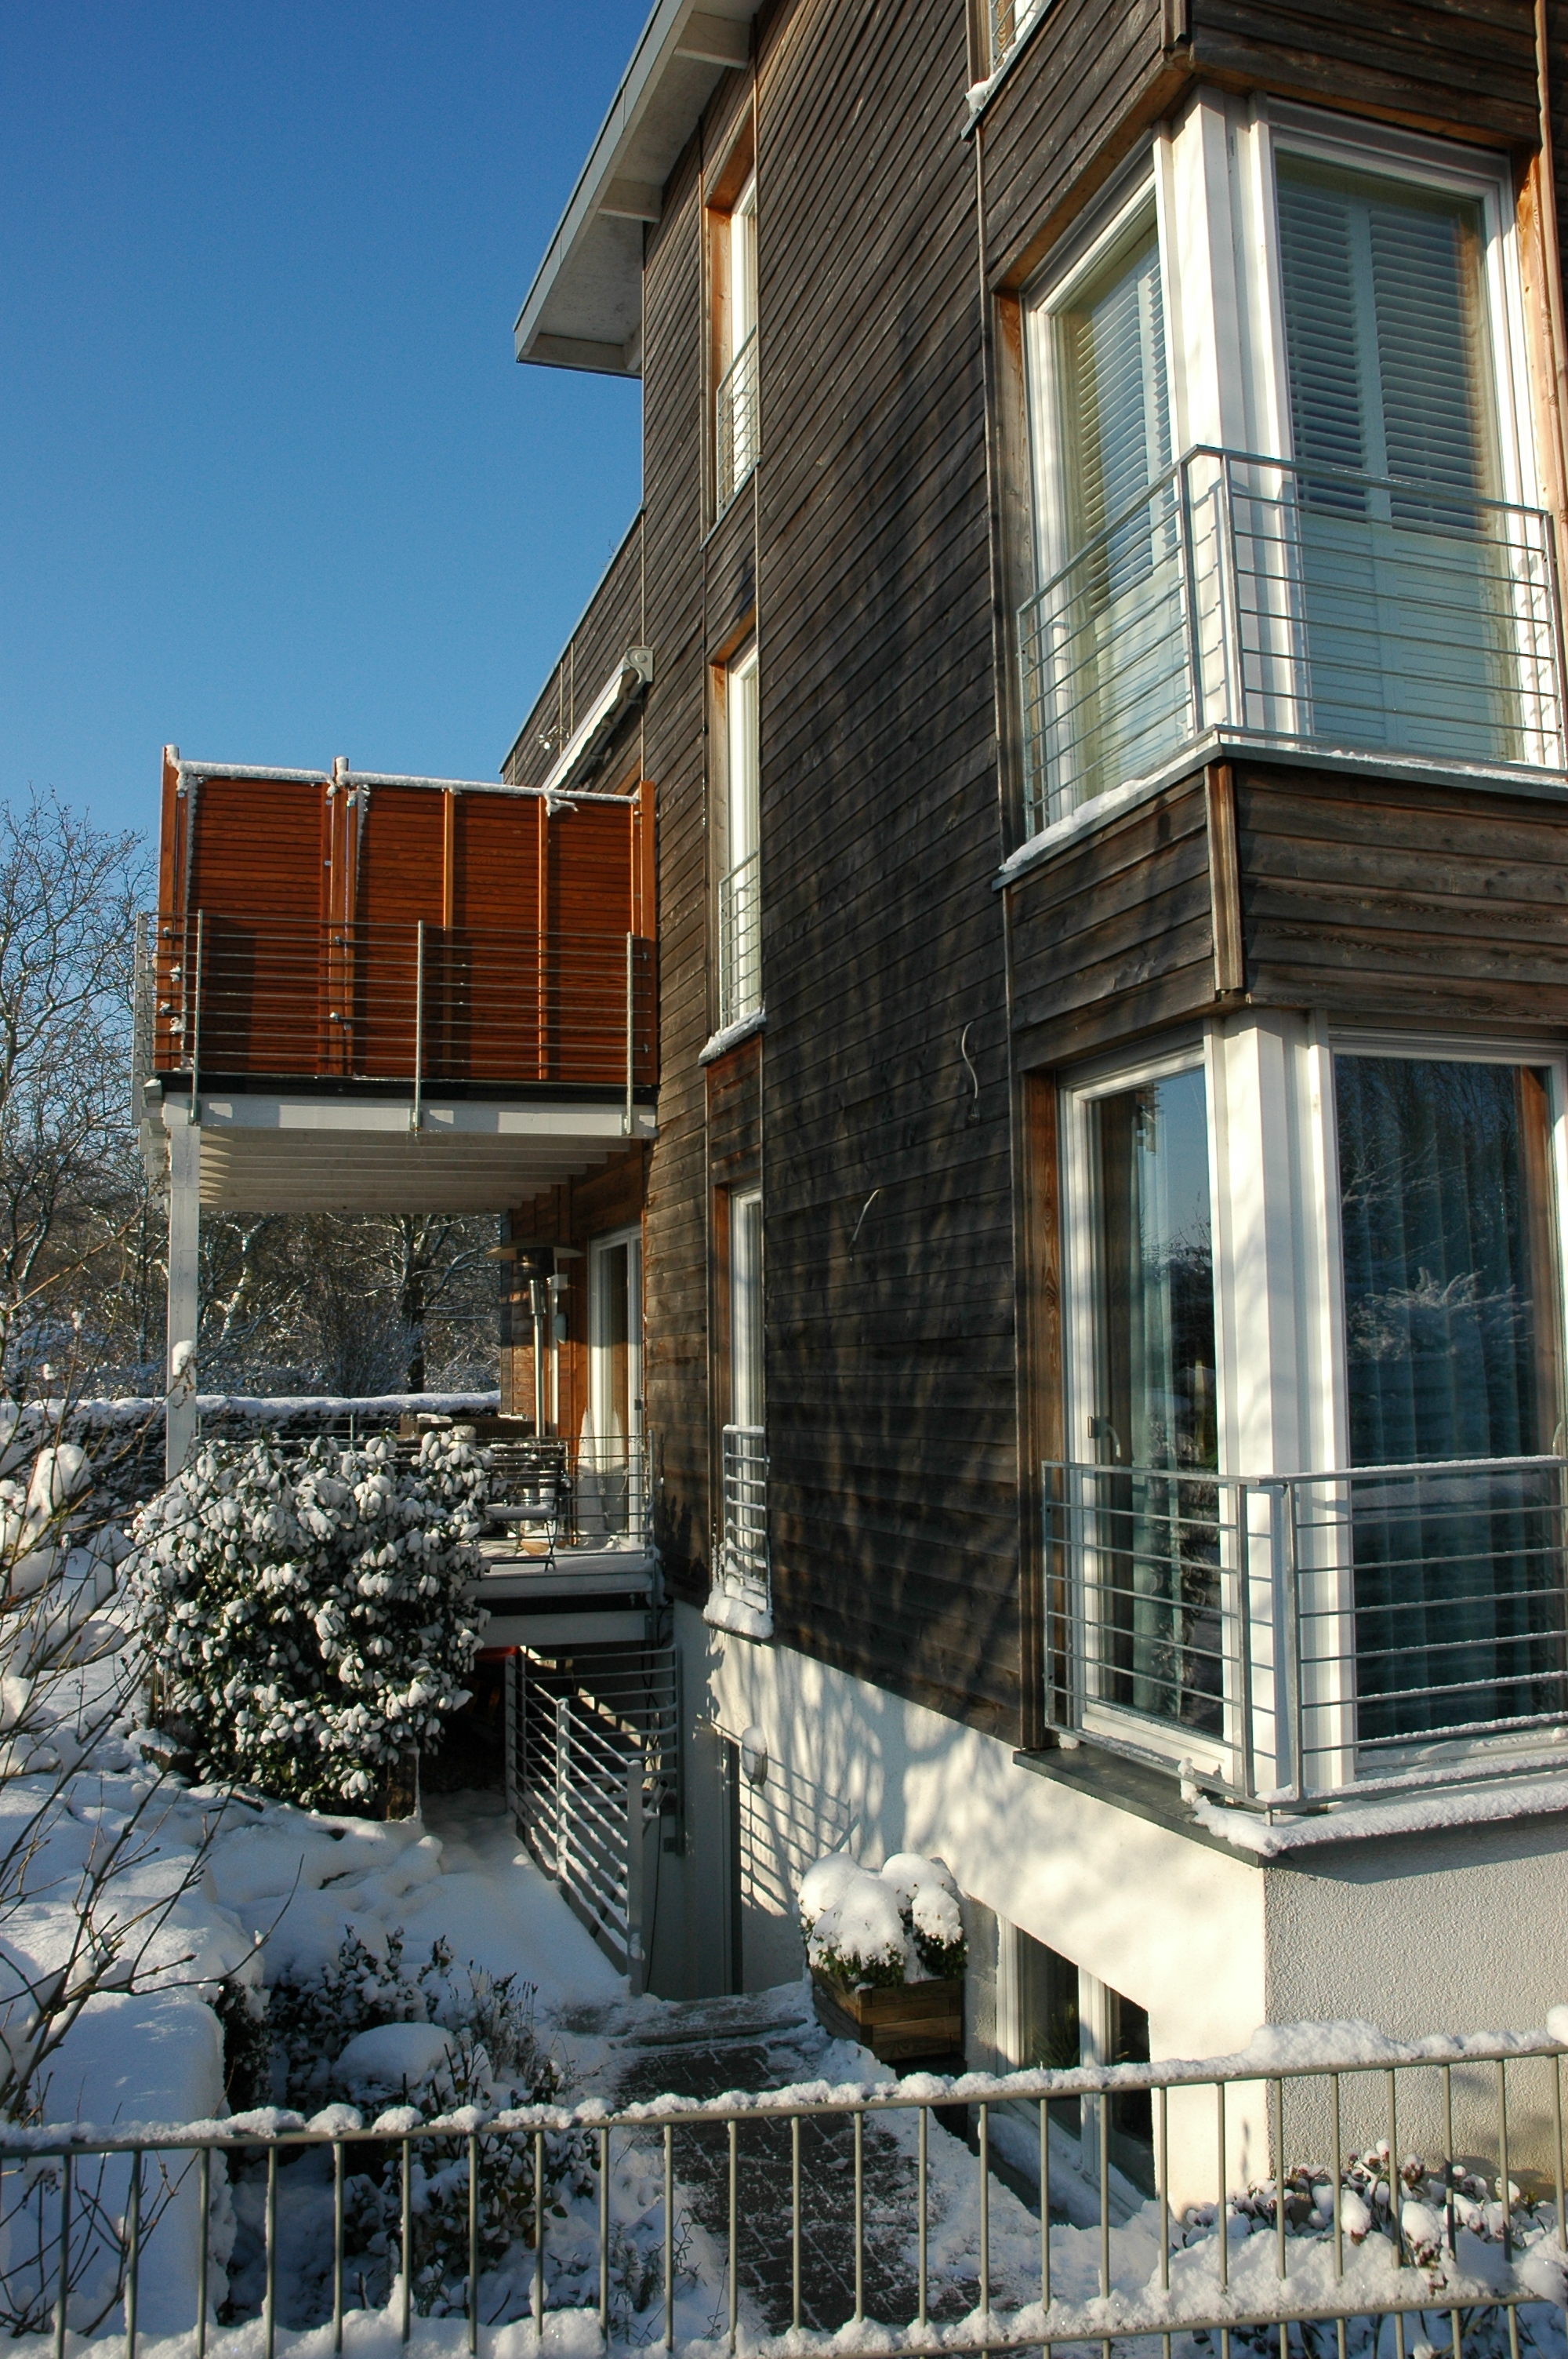 botzweg krefeld architekturb ro neuhoff krefeld. Black Bedroom Furniture Sets. Home Design Ideas